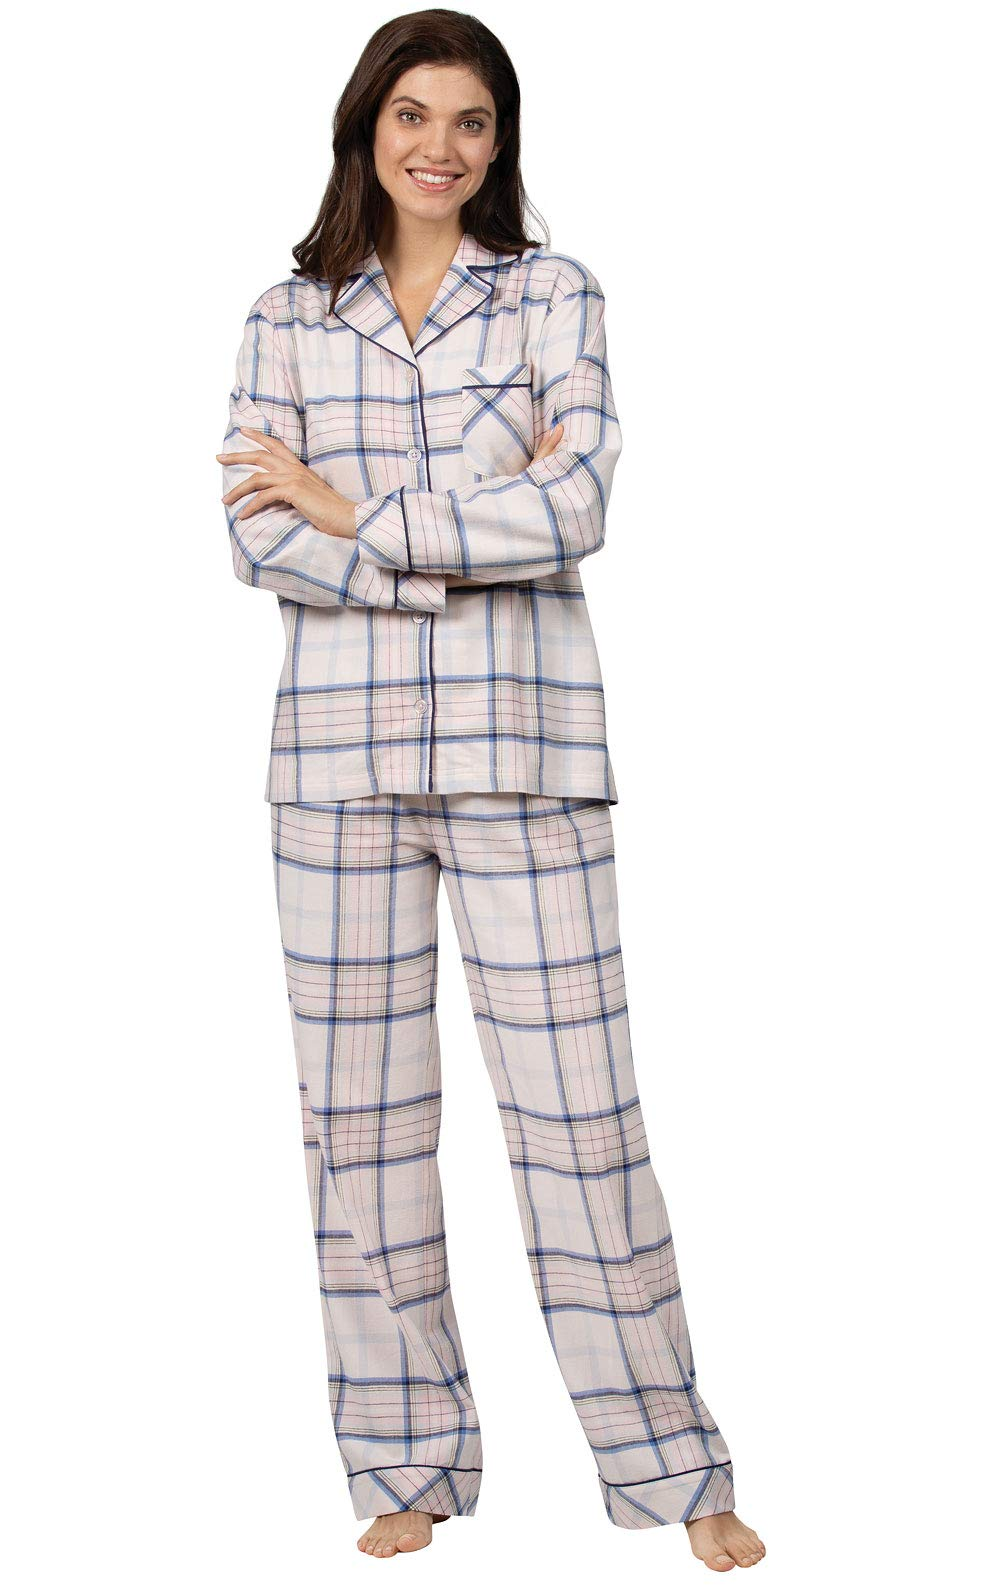 Addison Meadow Flannel Pajamas Women - Women Flannel Pajamas, Boyfriend, Plaid